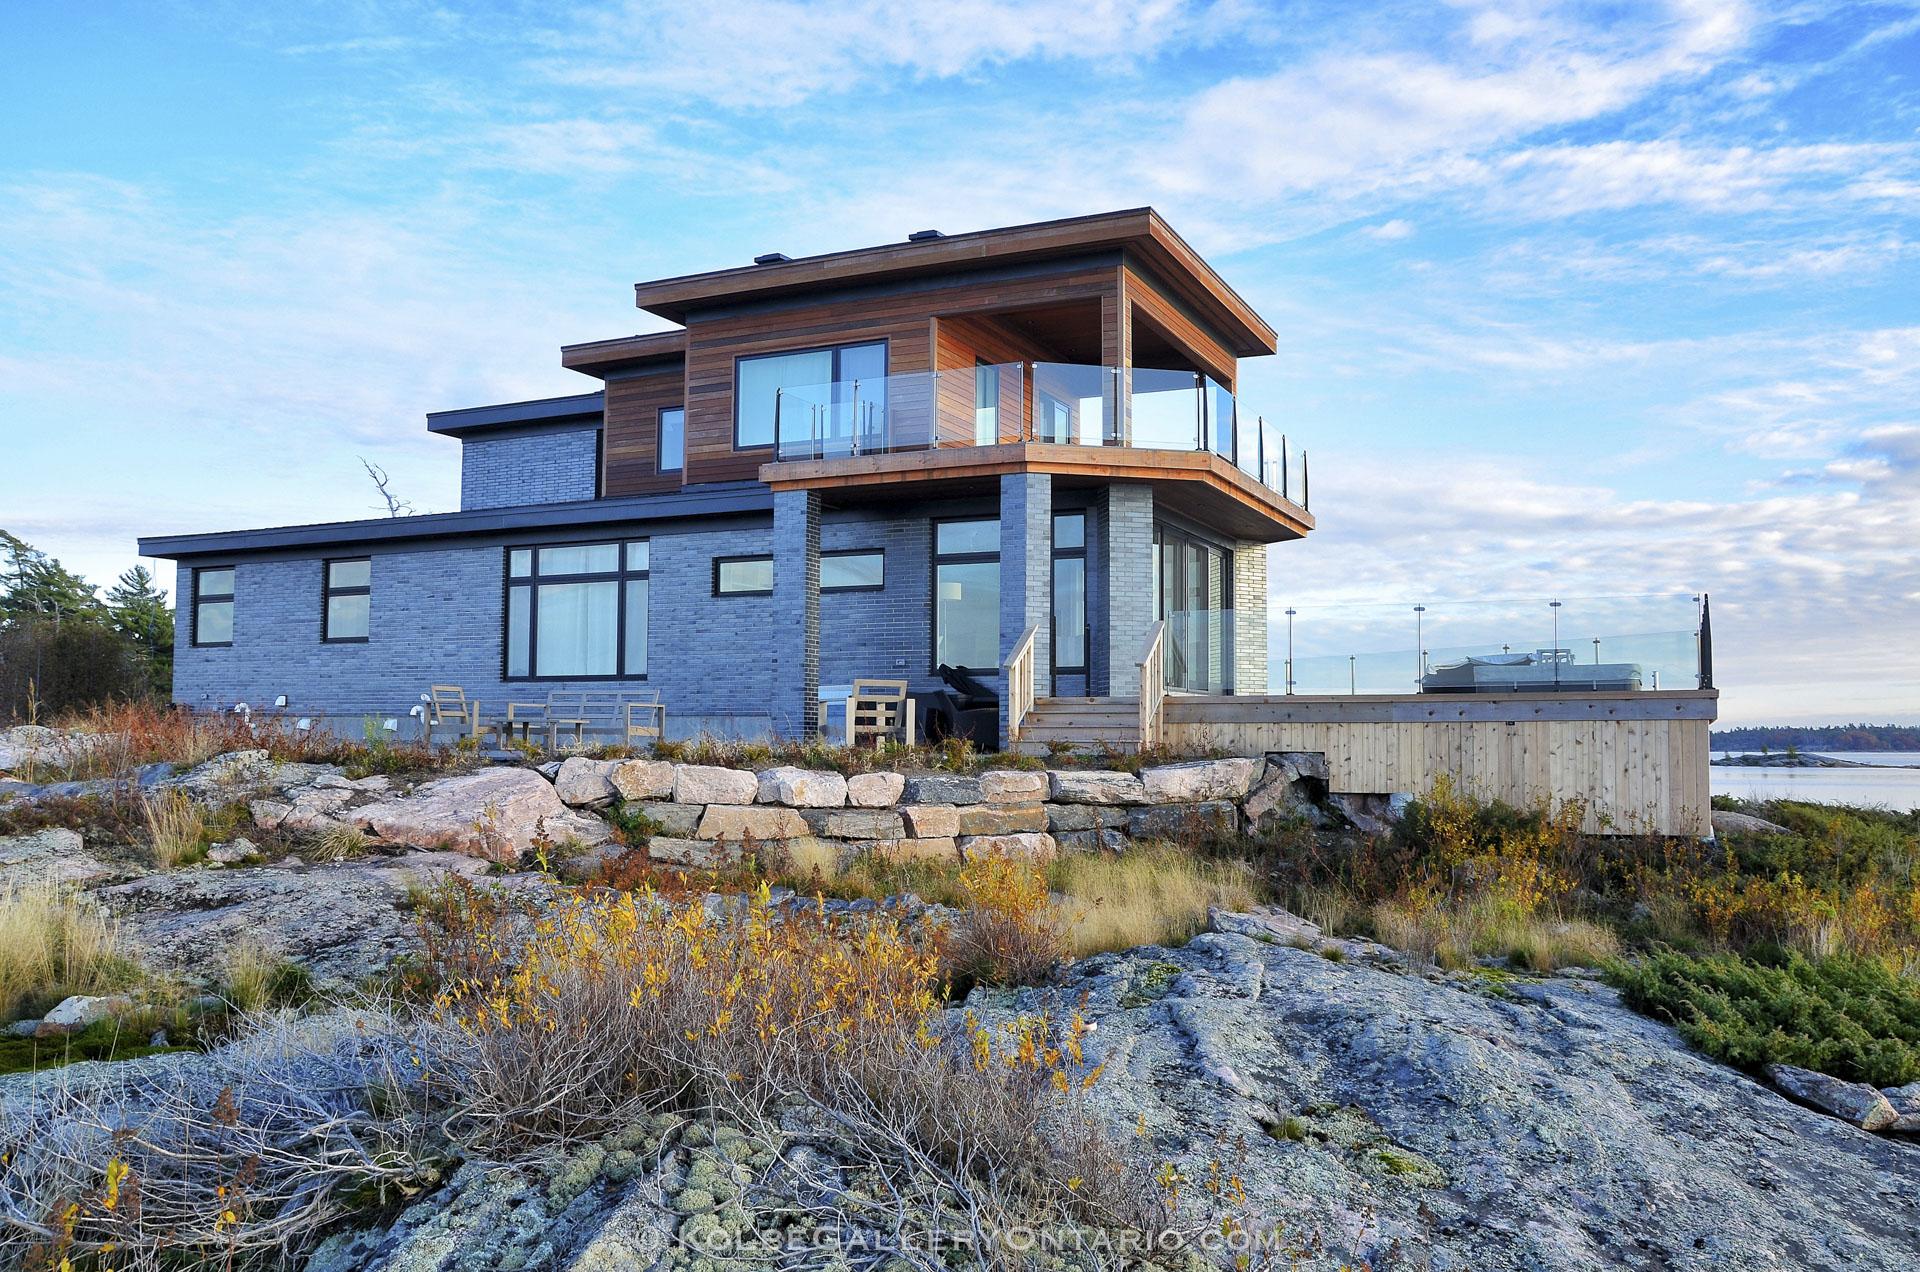 KolbeGalleryOntario.ca-windows-and-doors-20141024-172116-11